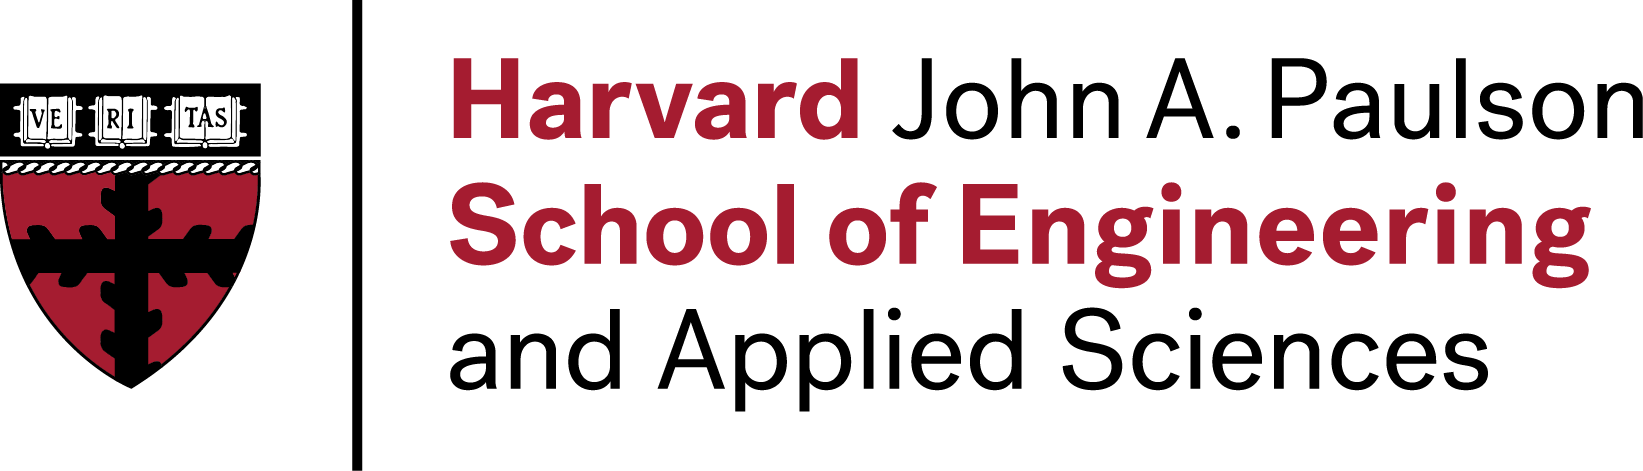 Harvard University School of Engineering and Applied Sciences